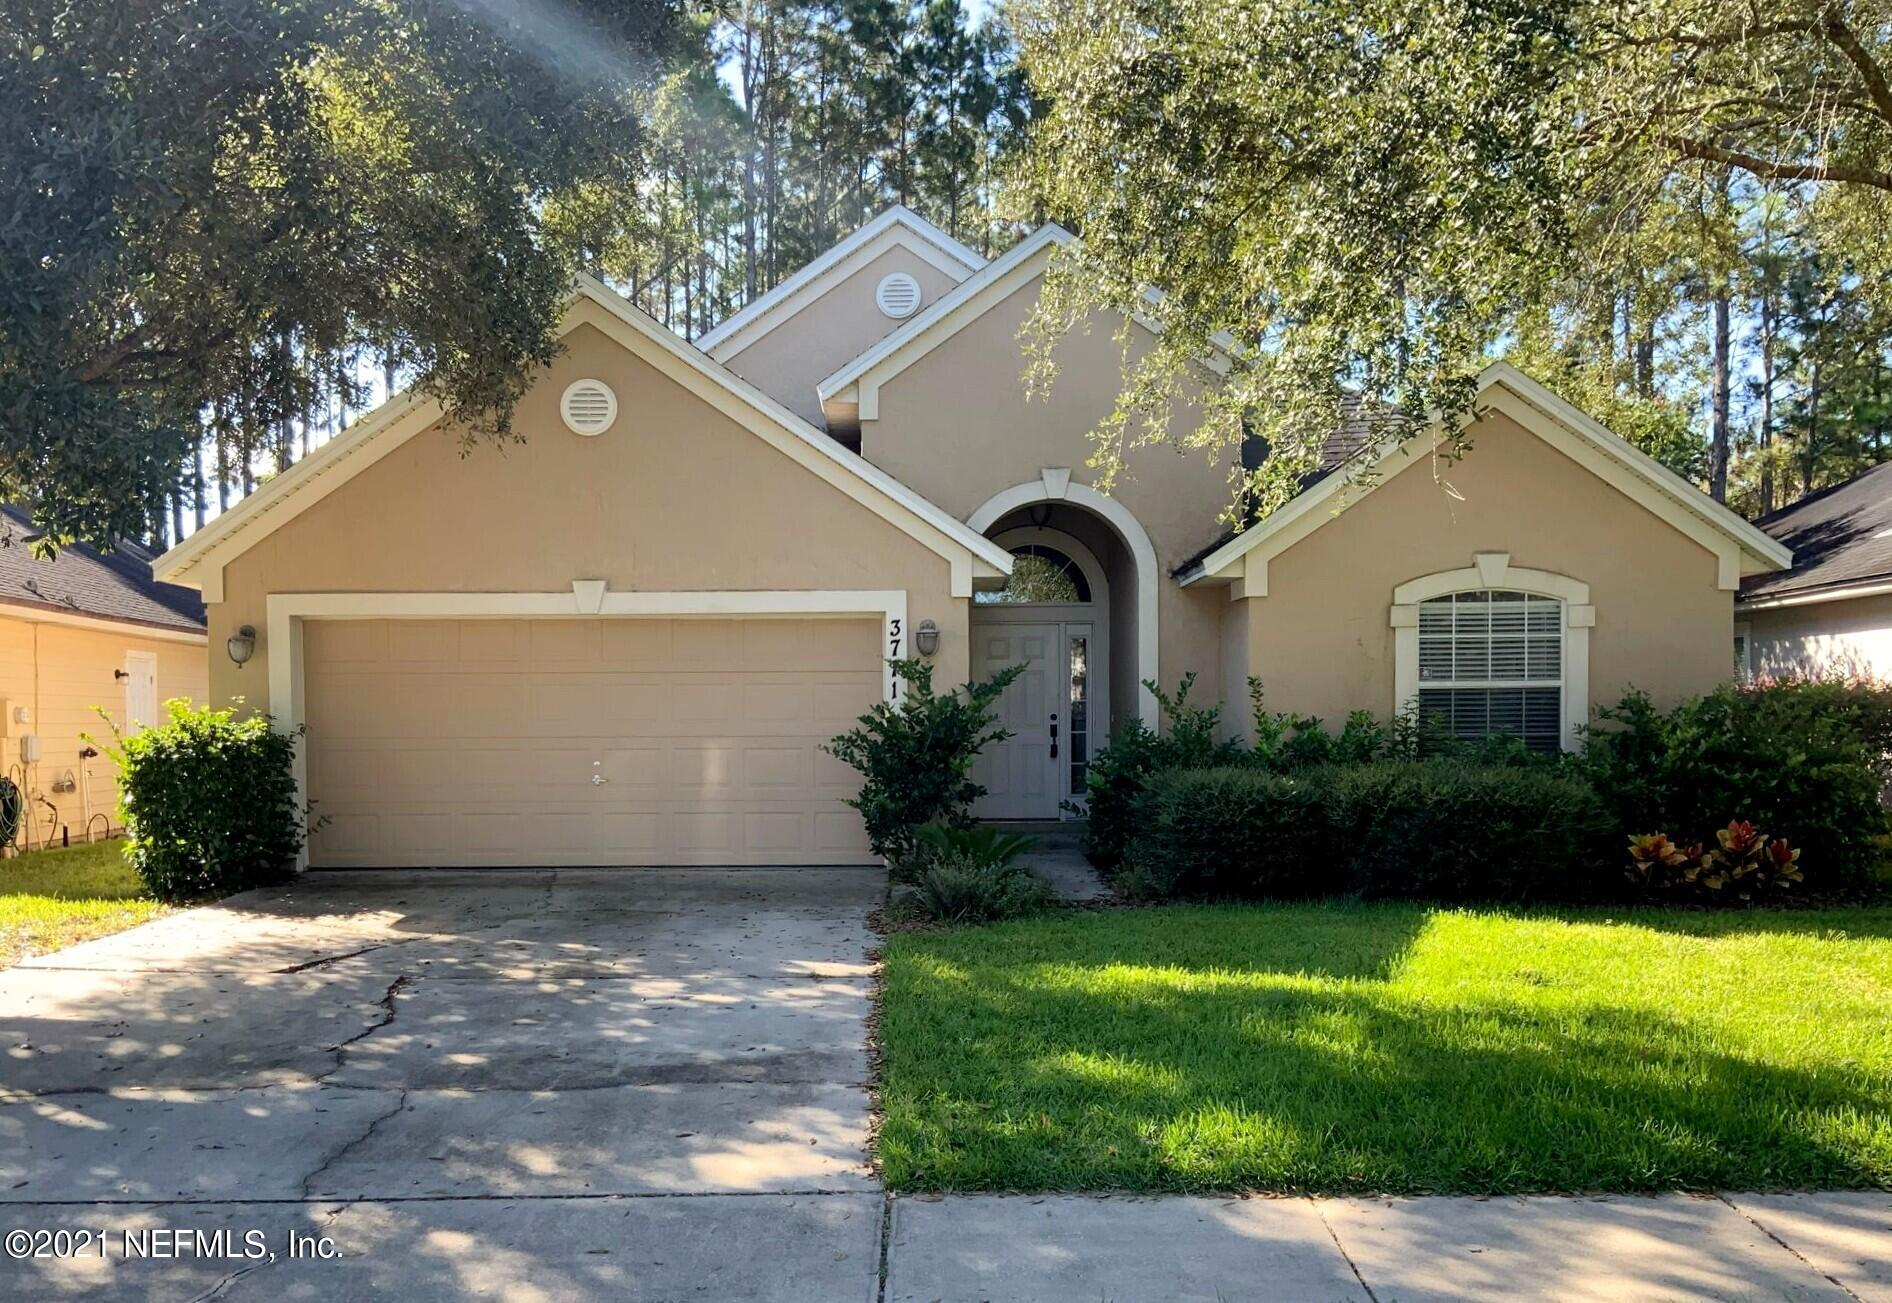 3771 TIMBERLINE, ORANGE PARK, FLORIDA 32065, 4 Bedrooms Bedrooms, ,3 BathroomsBathrooms,Residential,For sale,TIMBERLINE,1136679